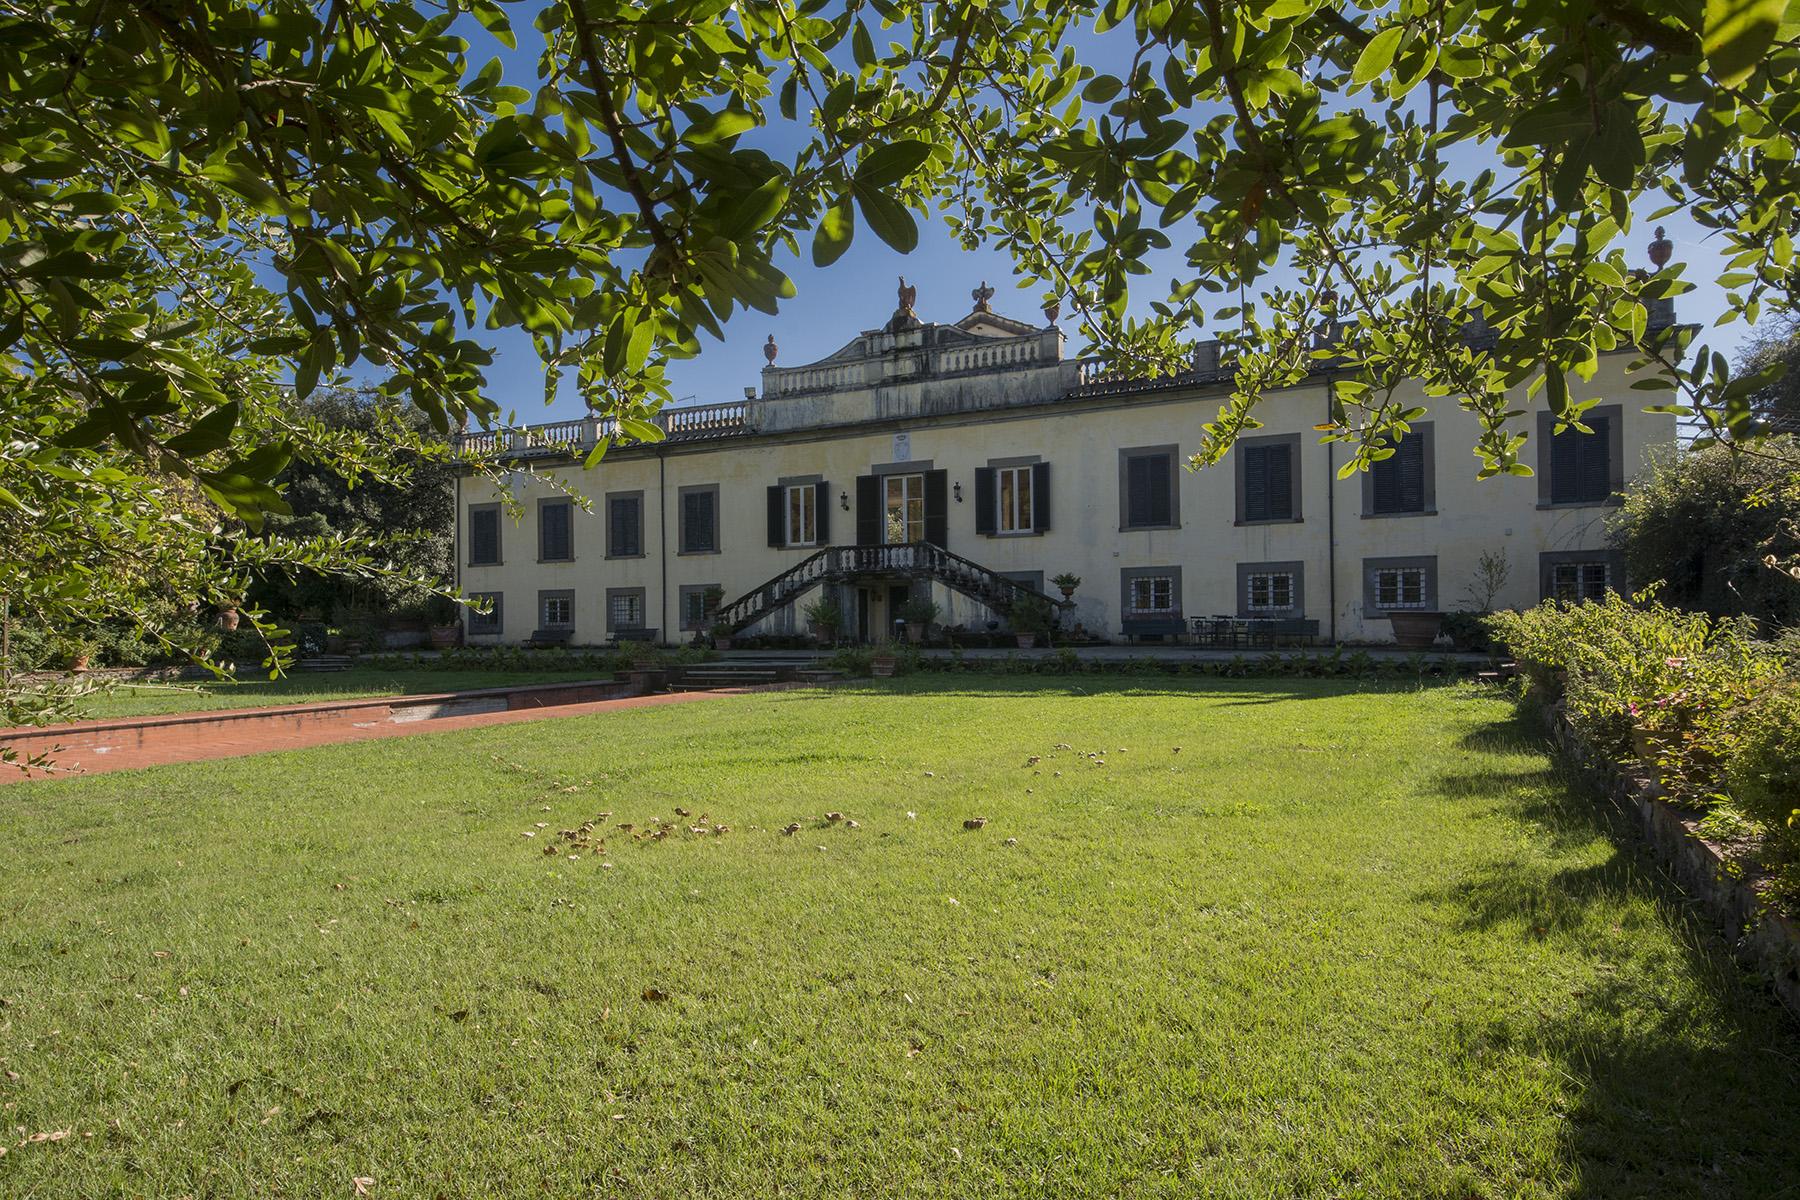 Villa in Vendita a Lucca: 5 locali, 2451 mq - Foto 15